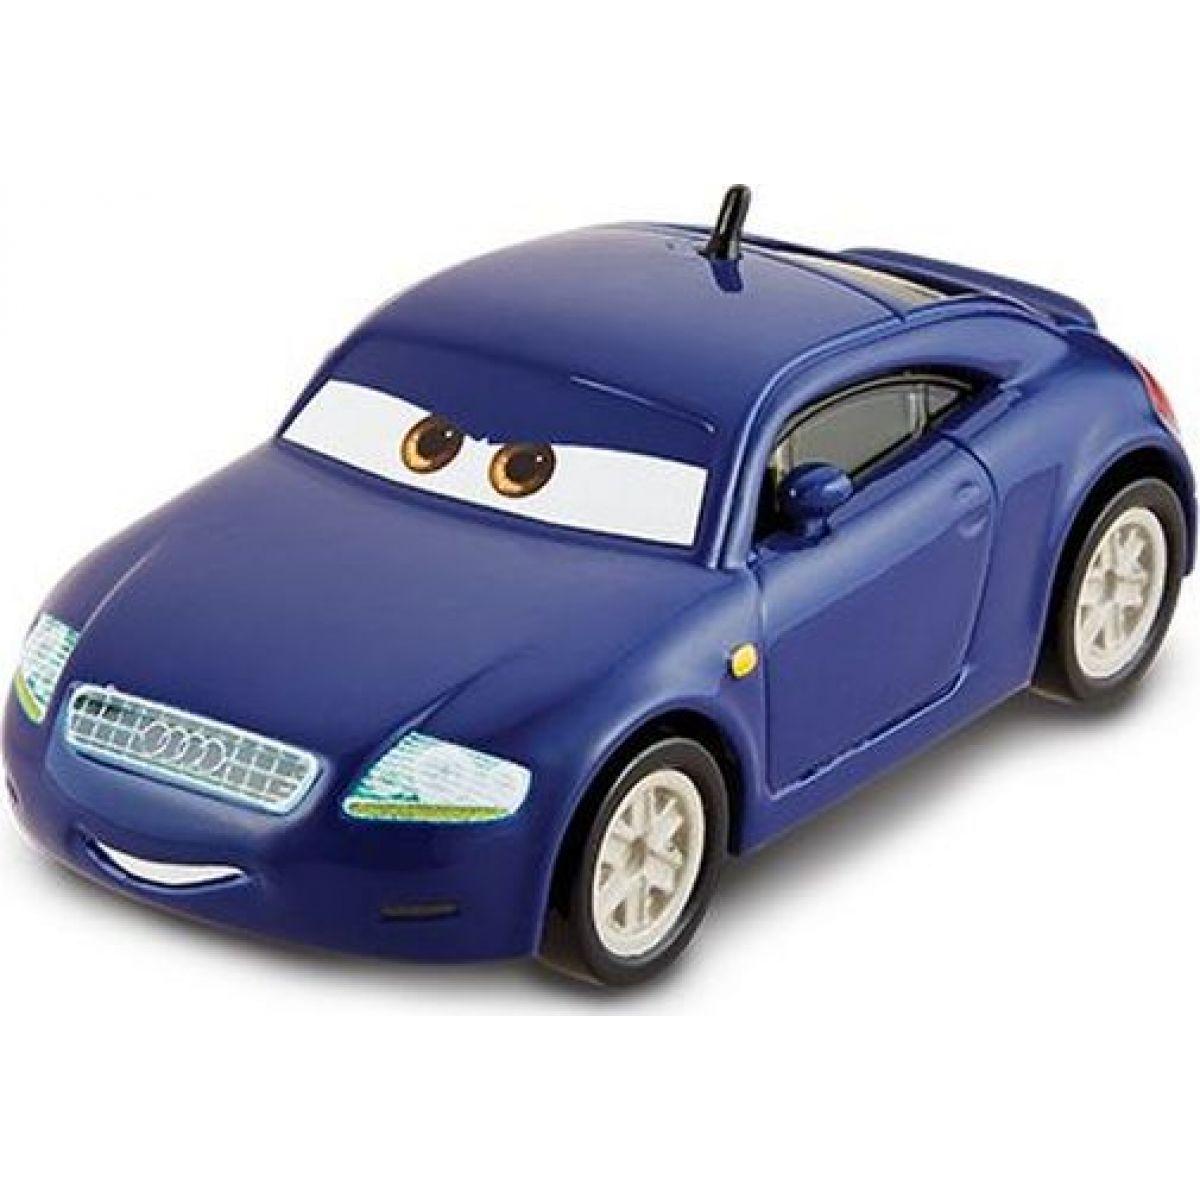 Mattel Cars 2 Auta - Sajan Karia